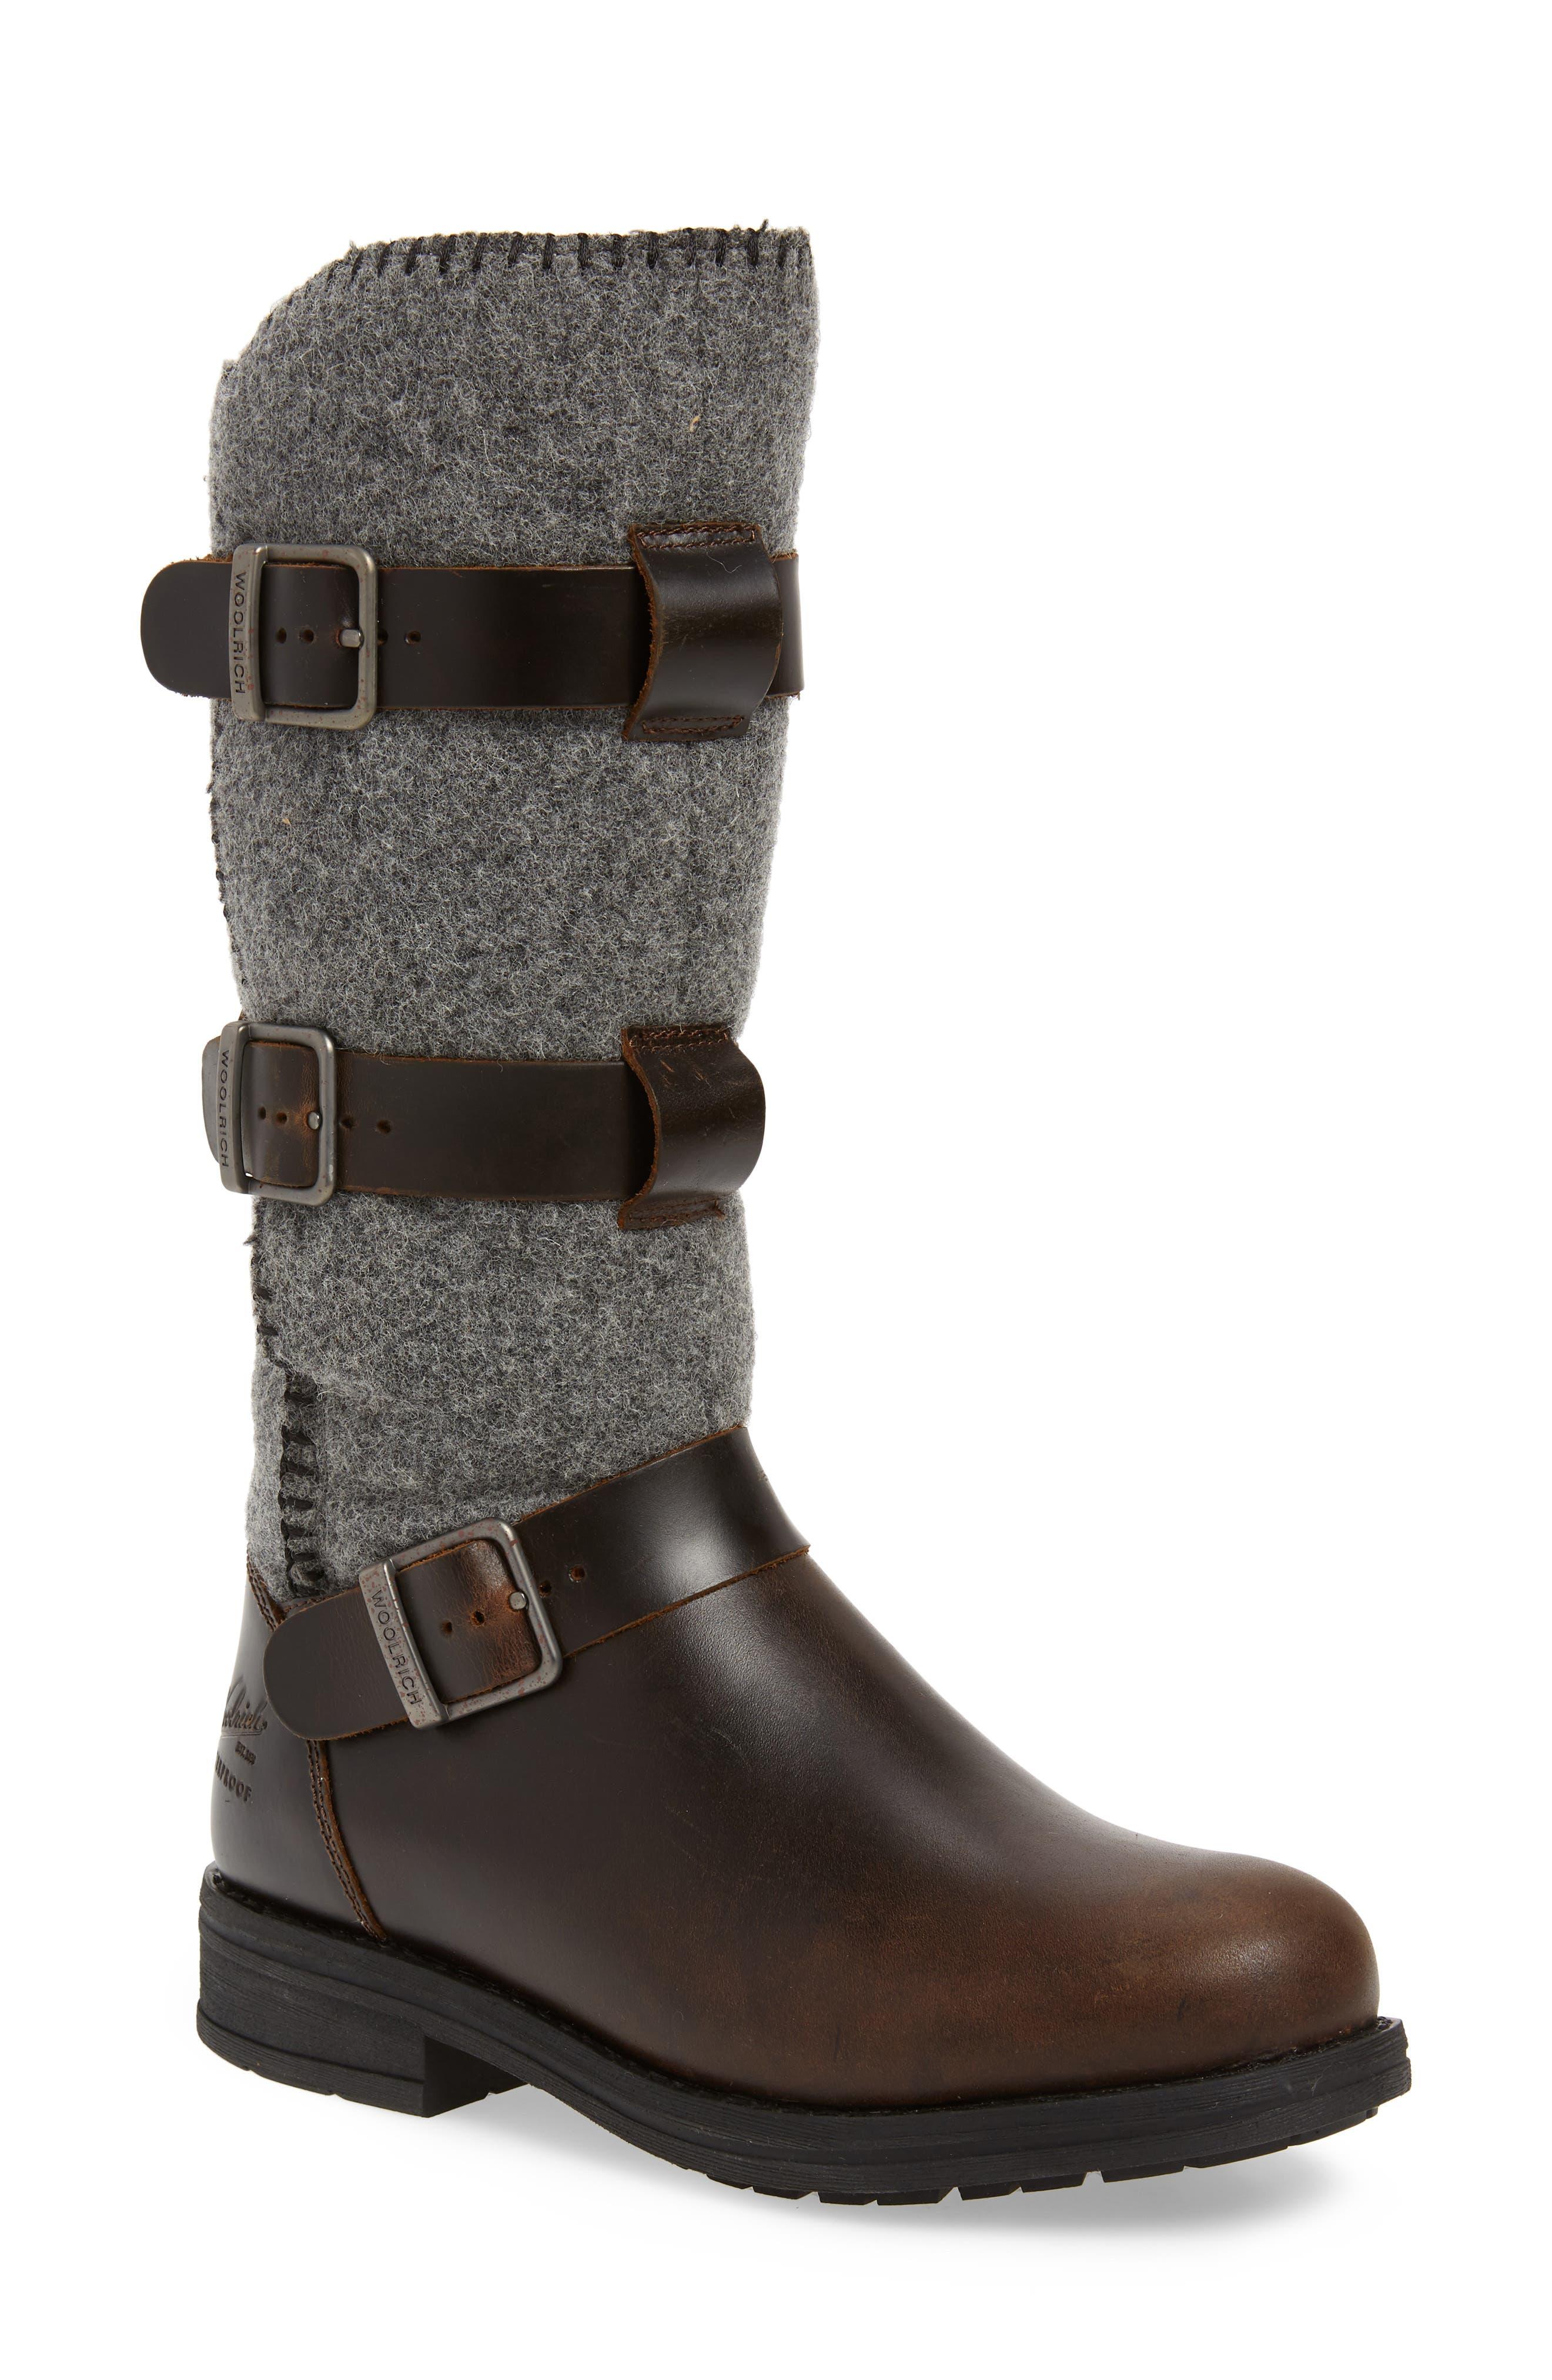 Woolrich Frontier Waterproof Boot, Grey